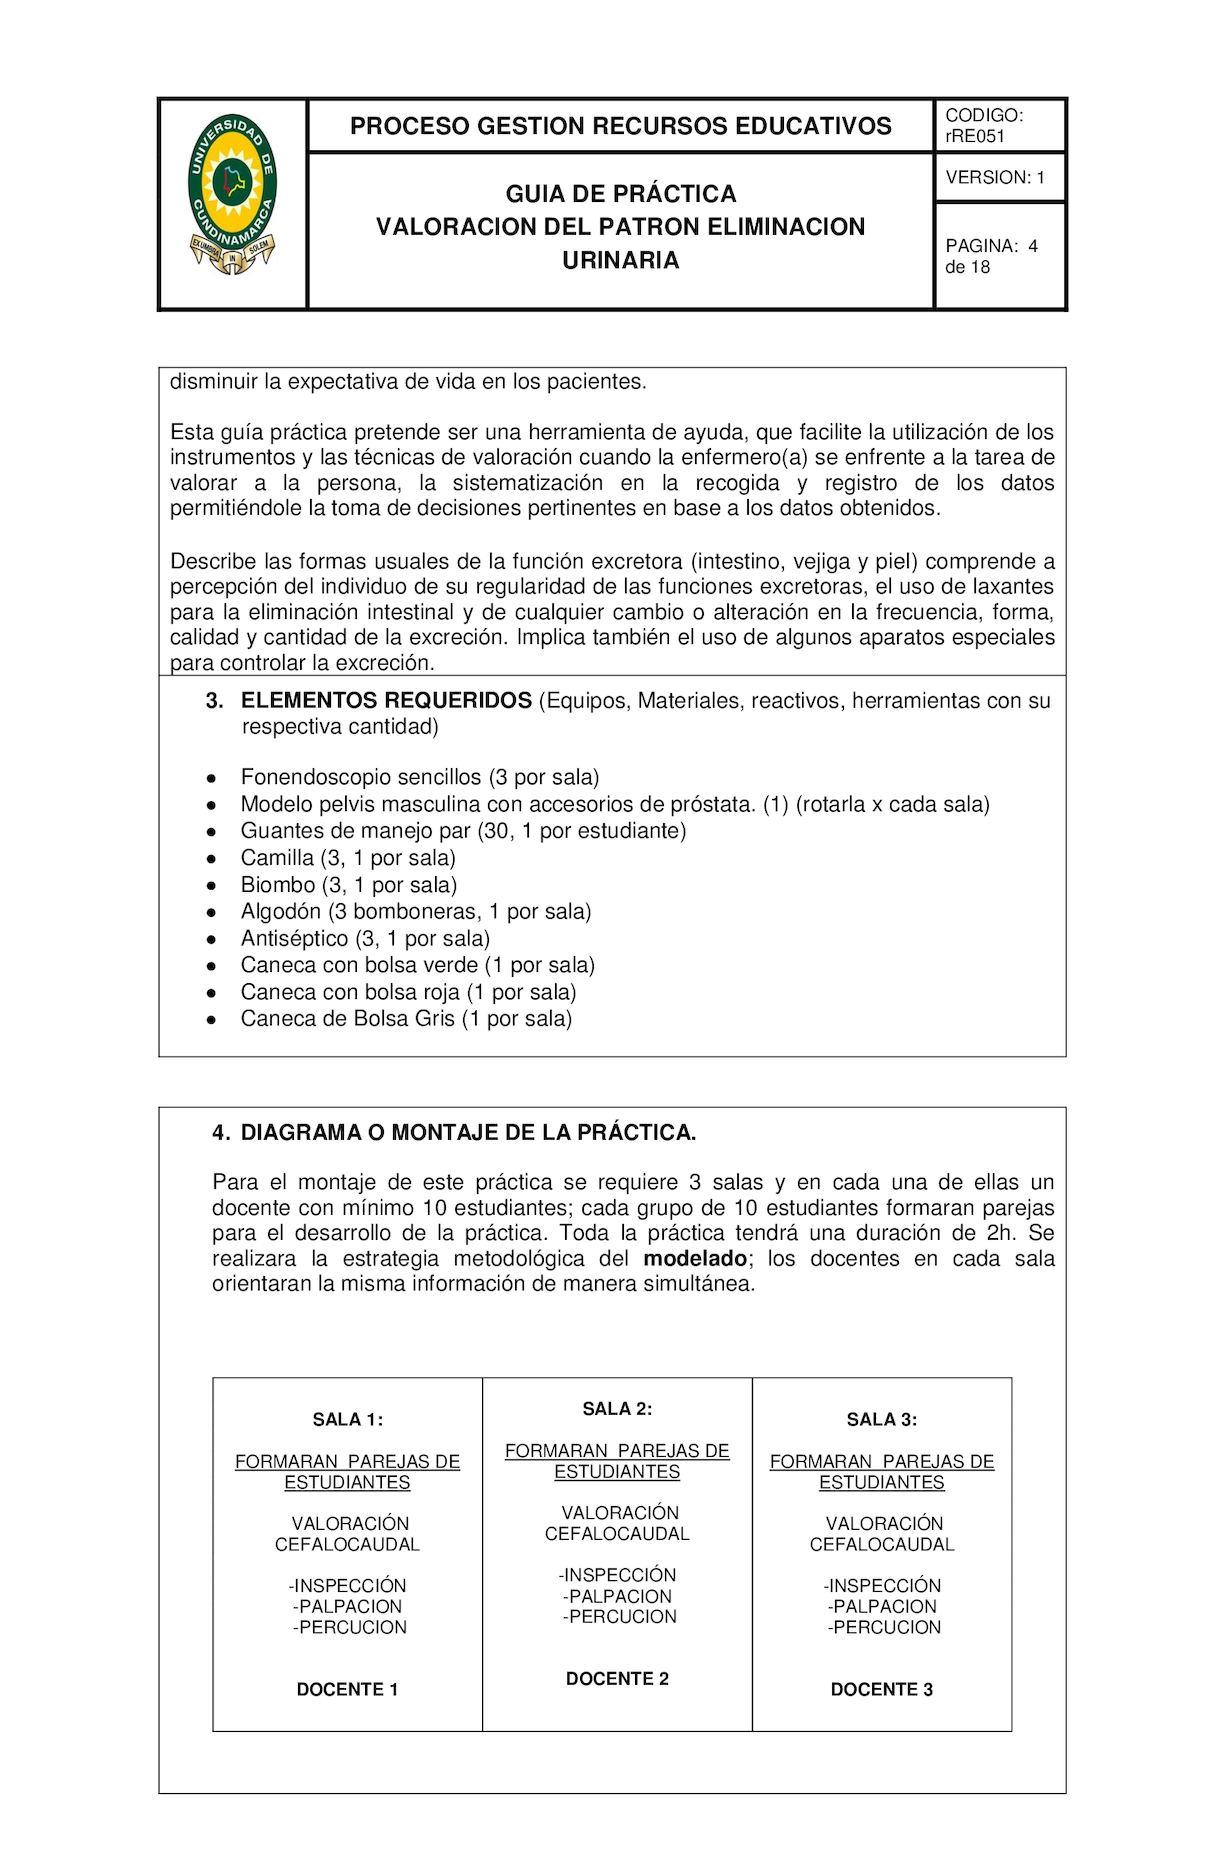 Guia Practica Eliminacion Urinario - CALAMEO Downloader